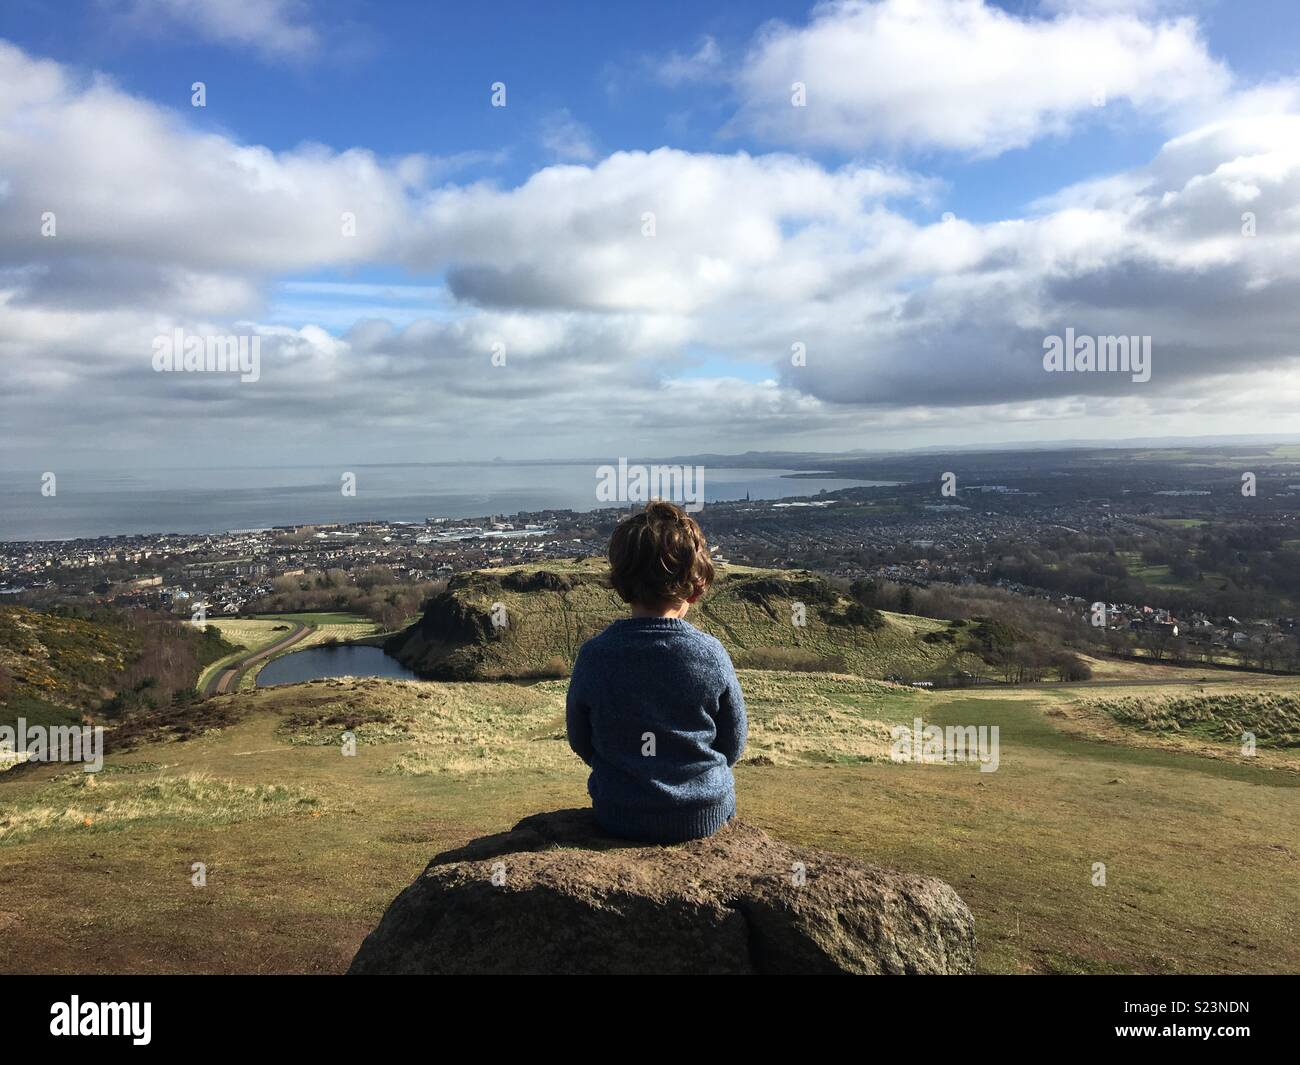 Ragazzo seduto alla Arthur' Seat, Edimburgo Immagini Stock